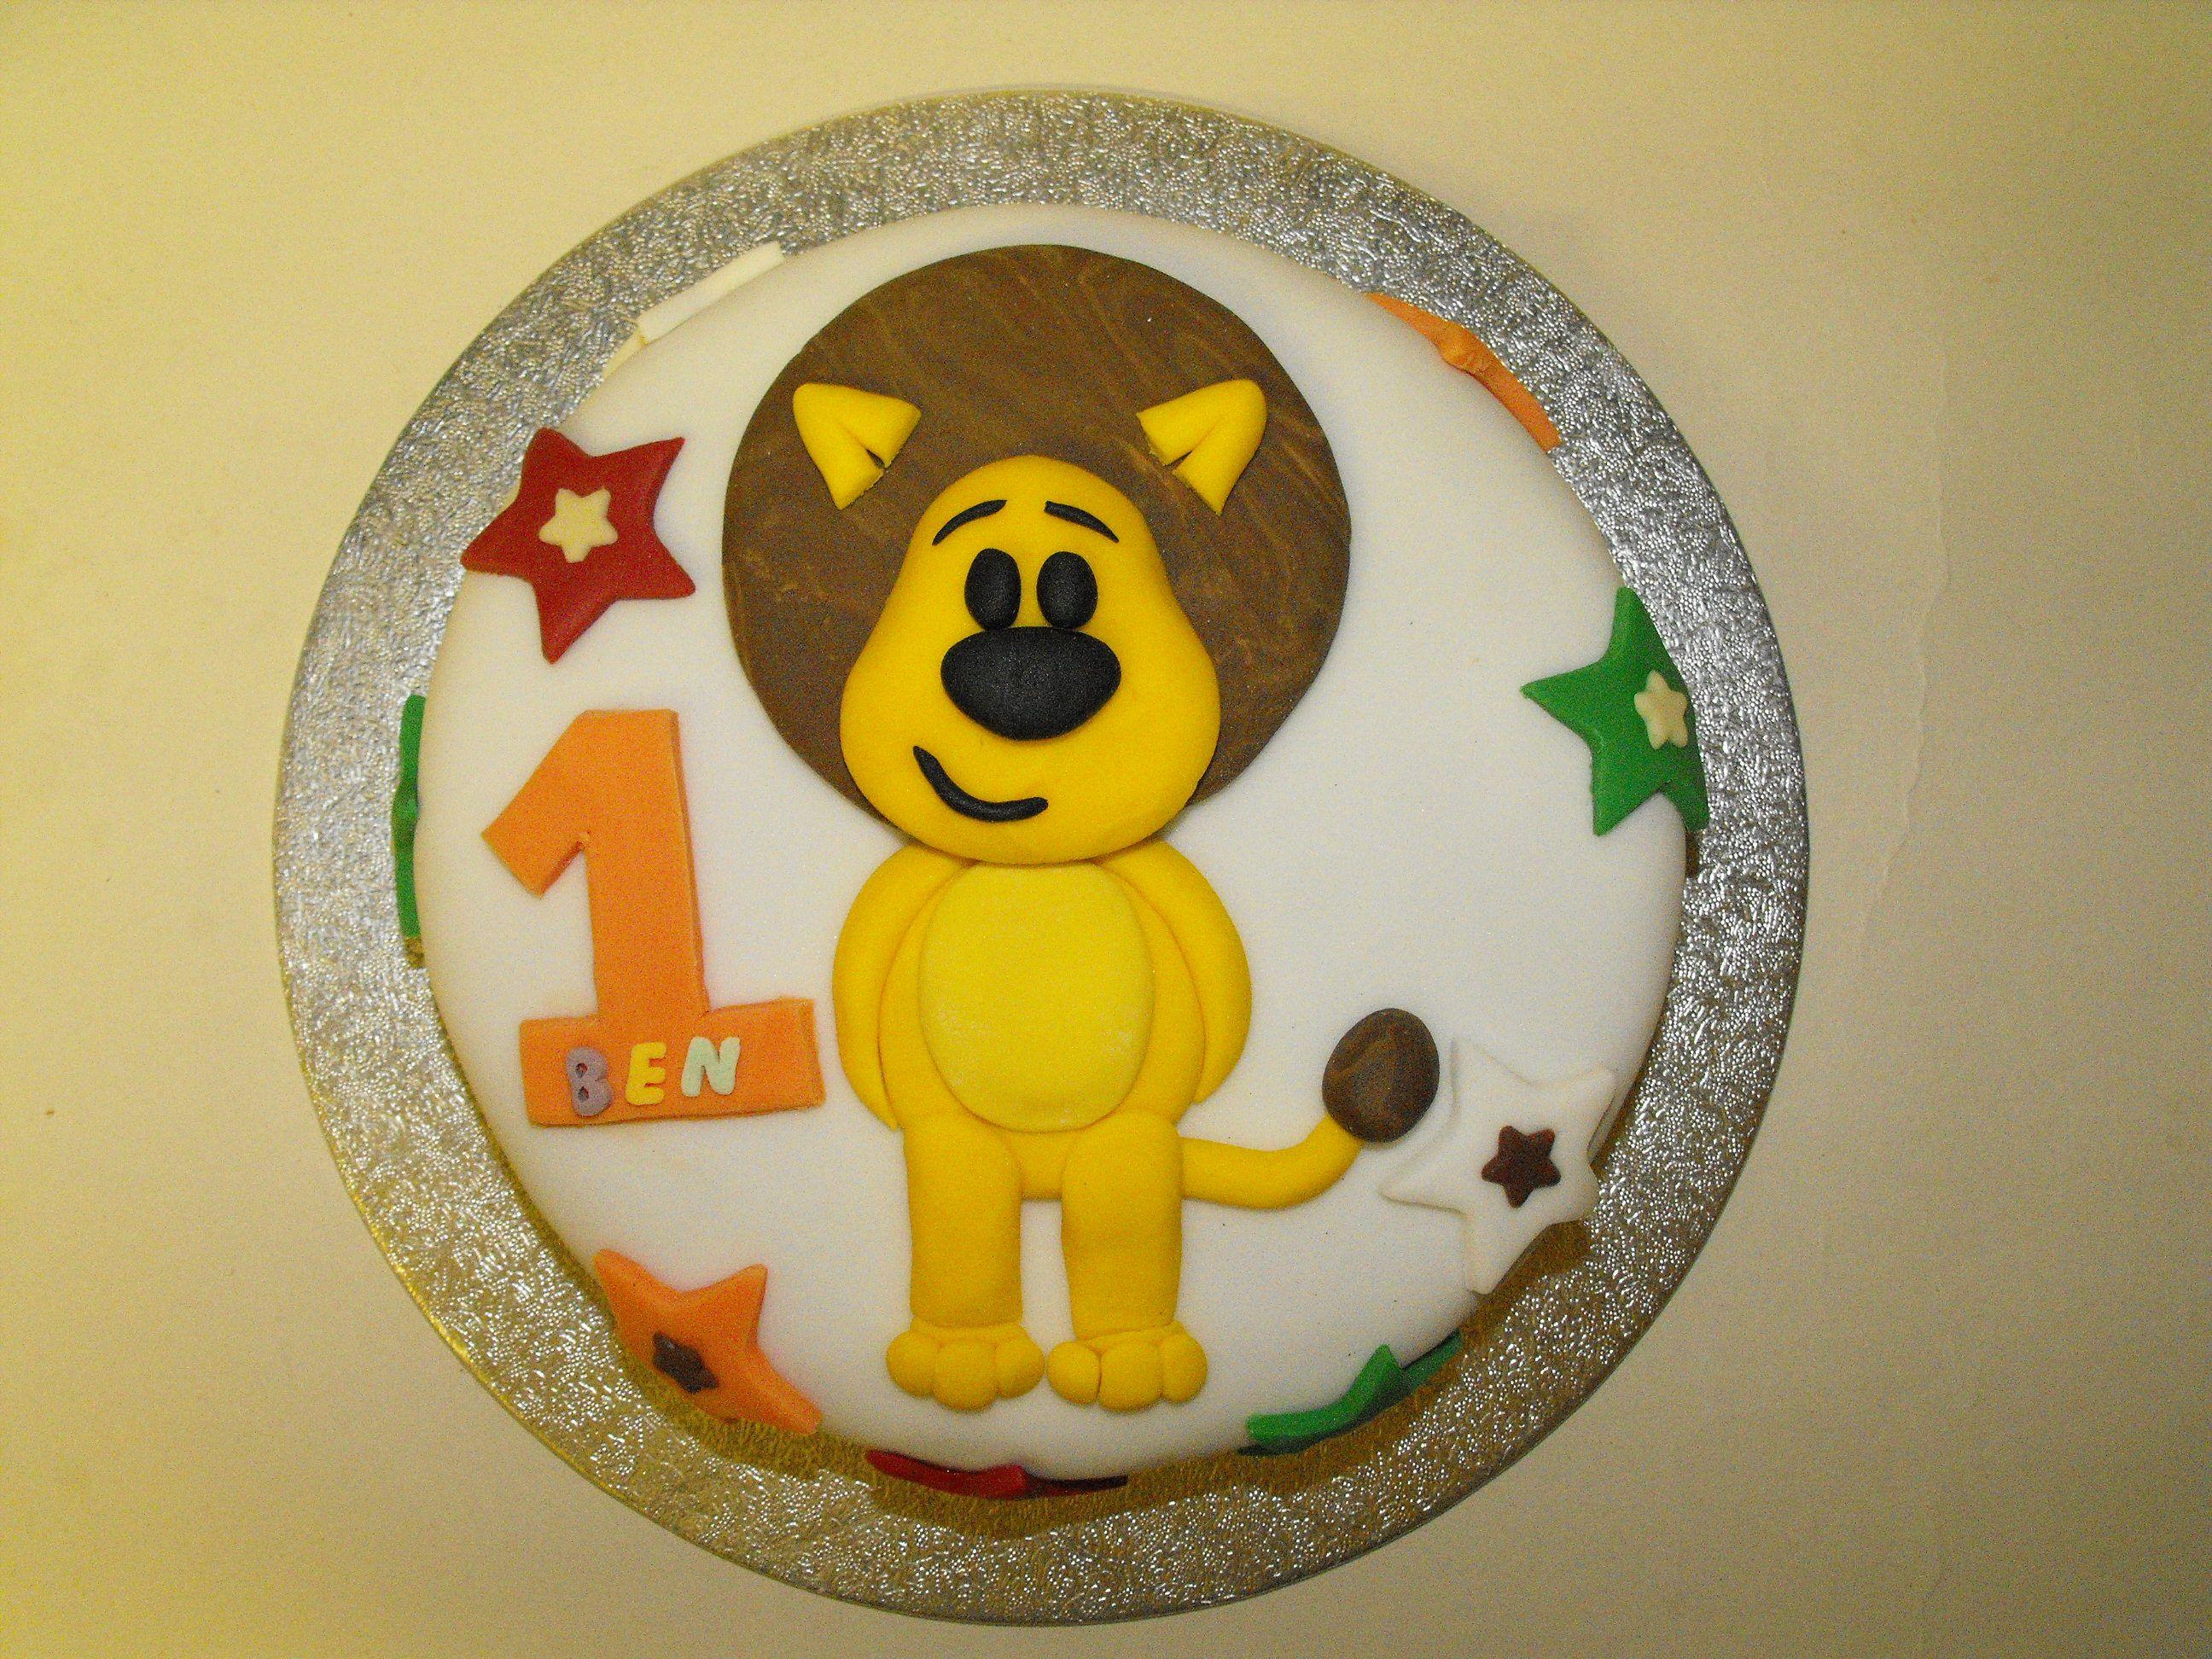 Best Raa Raa The Noisy Lion Party Images On Pinterest Lion - Lion birthday cake design